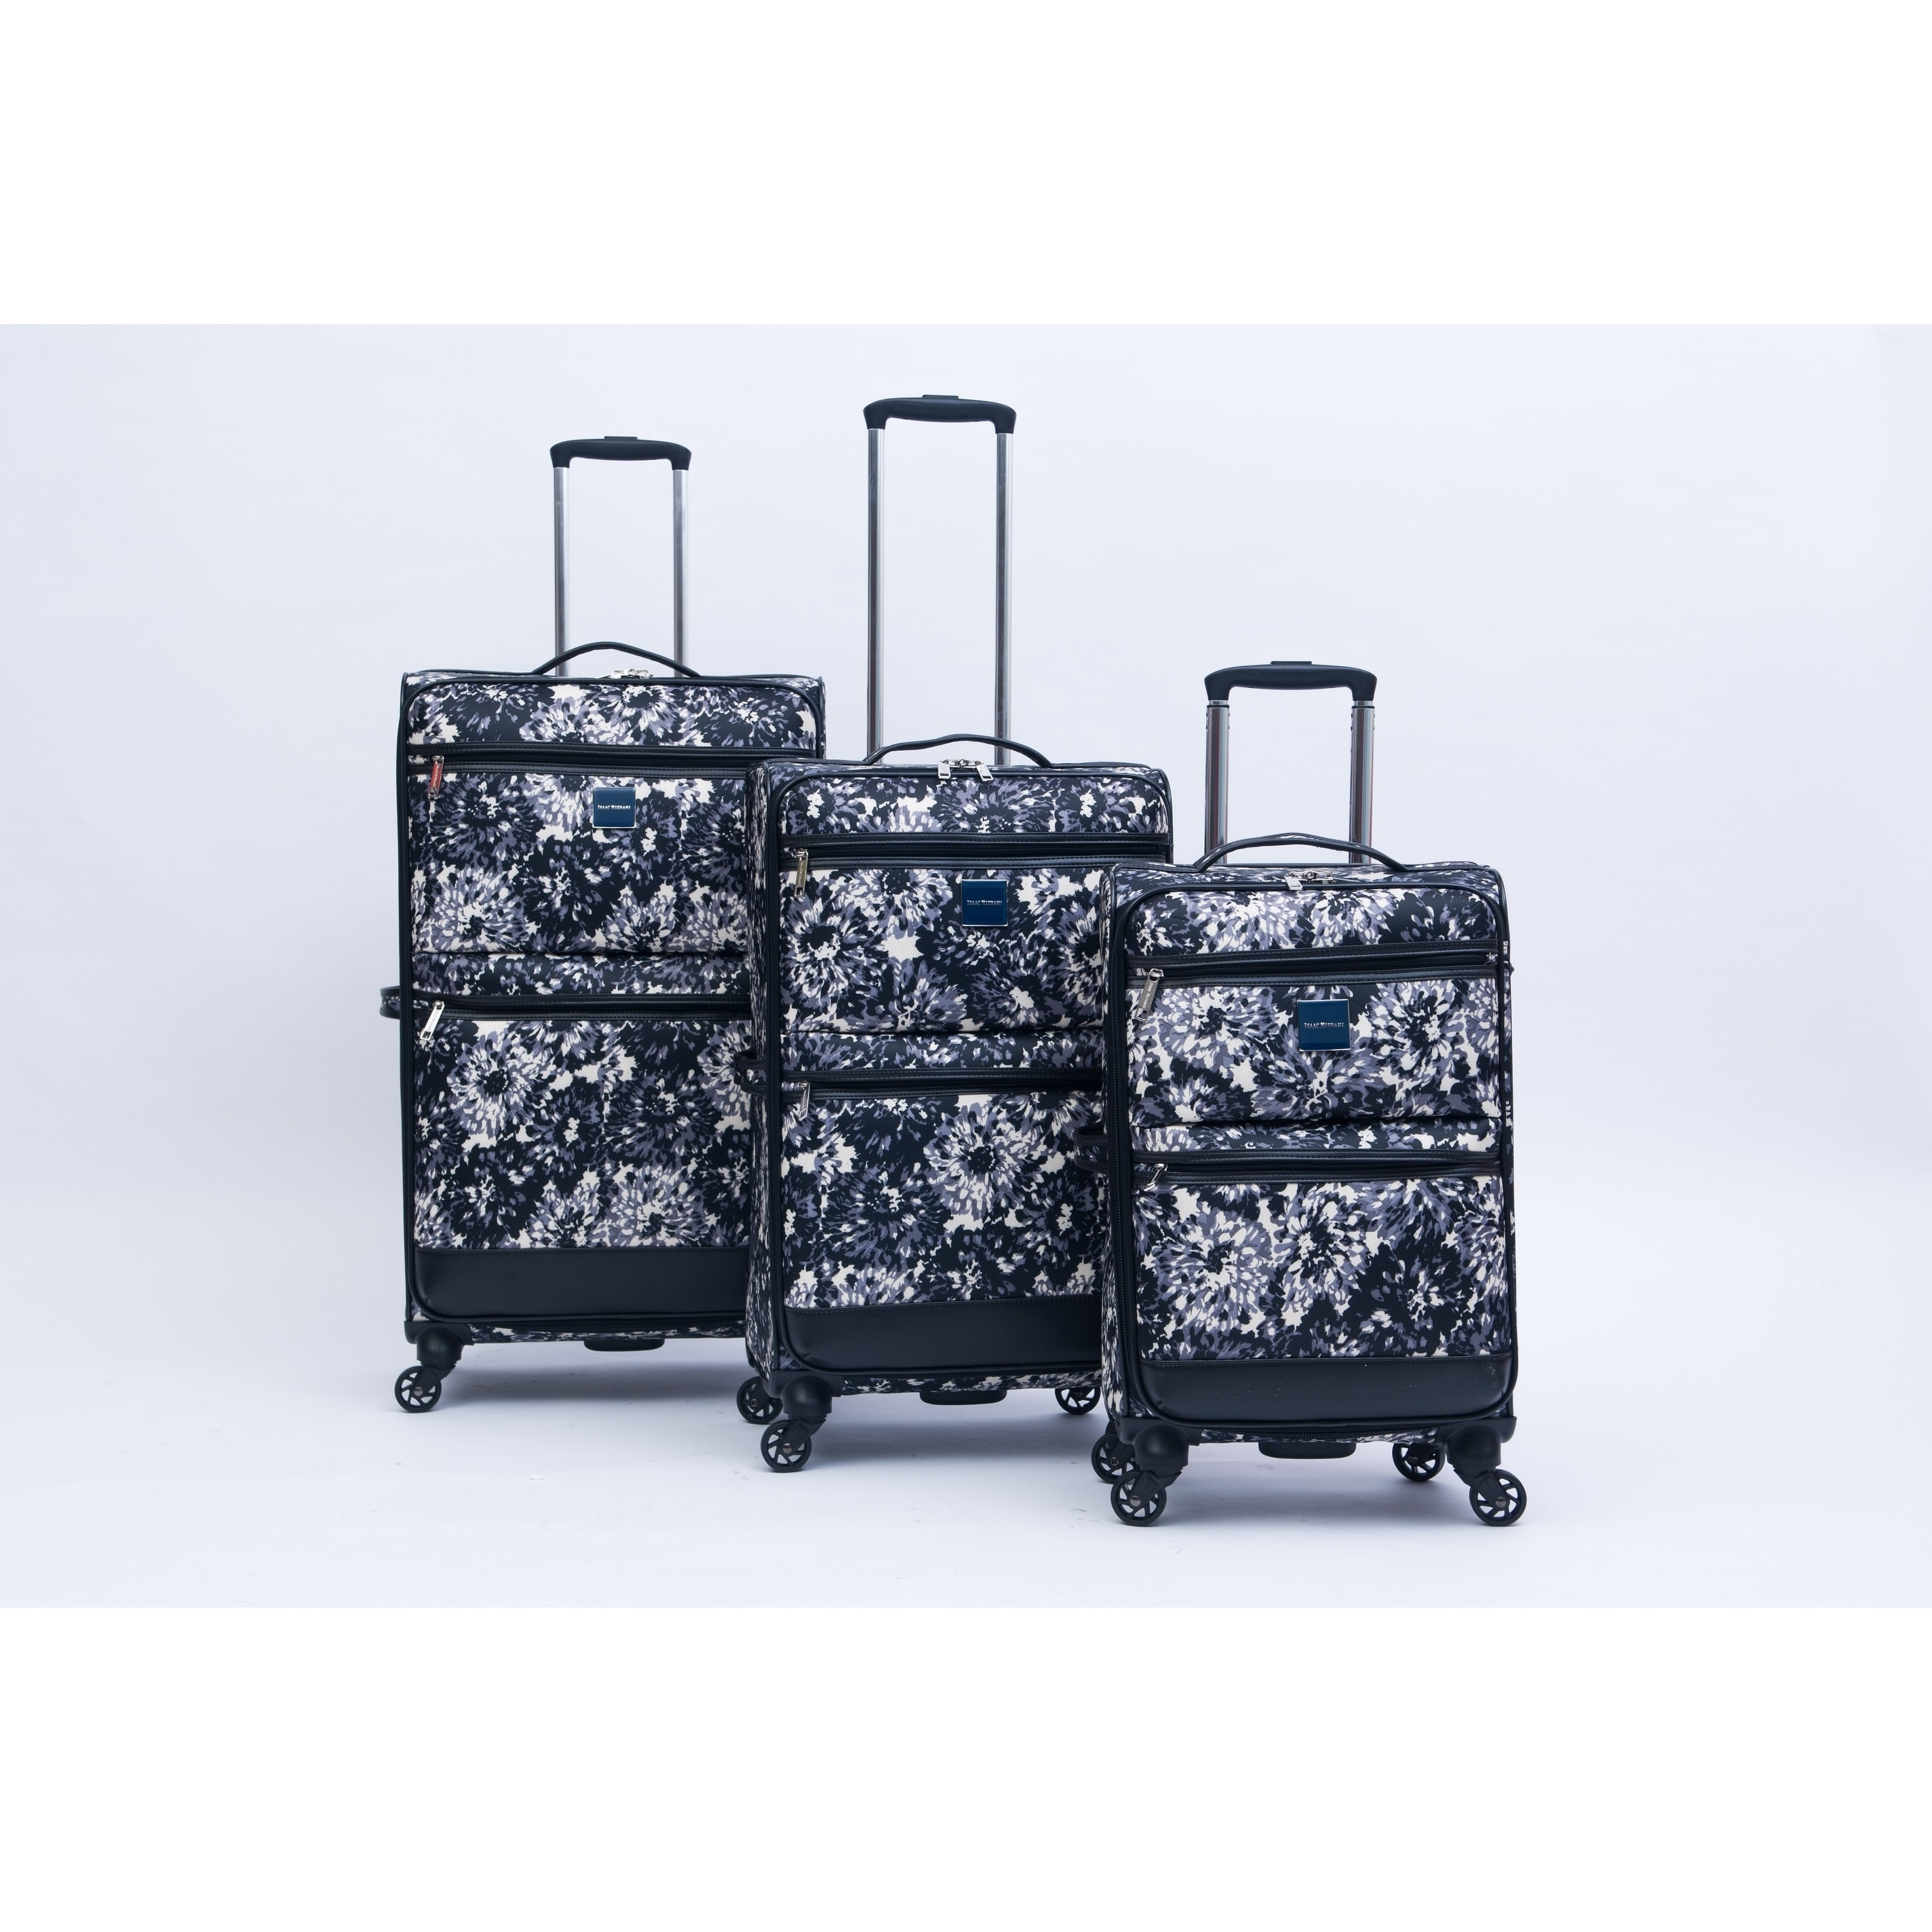 70b519bb5 Isaac Mizrahi Boldon 26-inch 4-Wheel Spinner Suitcase 40413024248   eBay